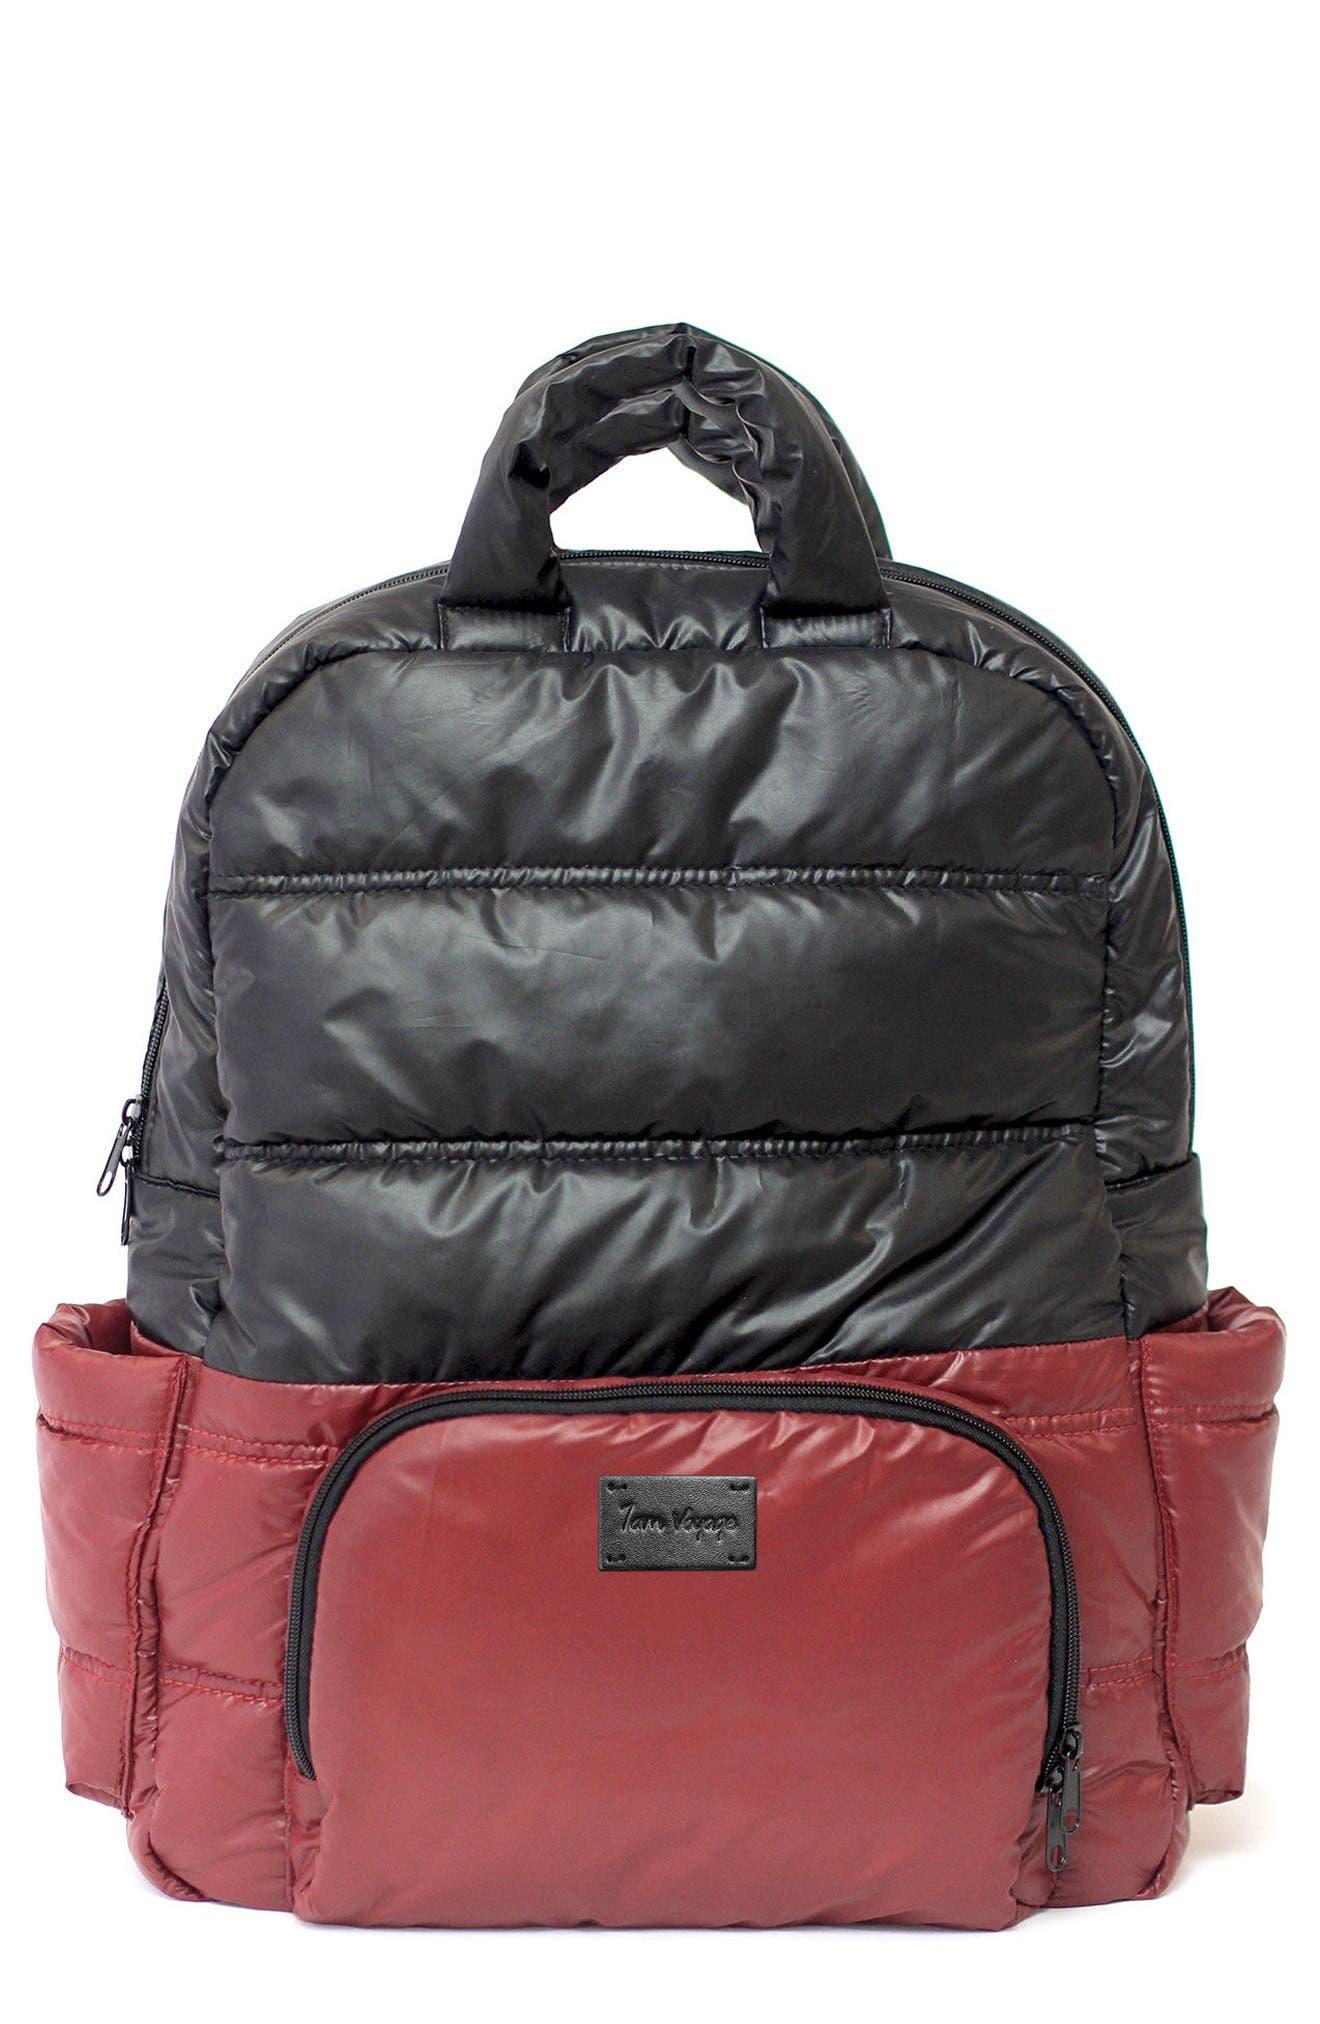 Main Image - 7 A.M. Enfant BK718 Water Repellent Diaper Backpack